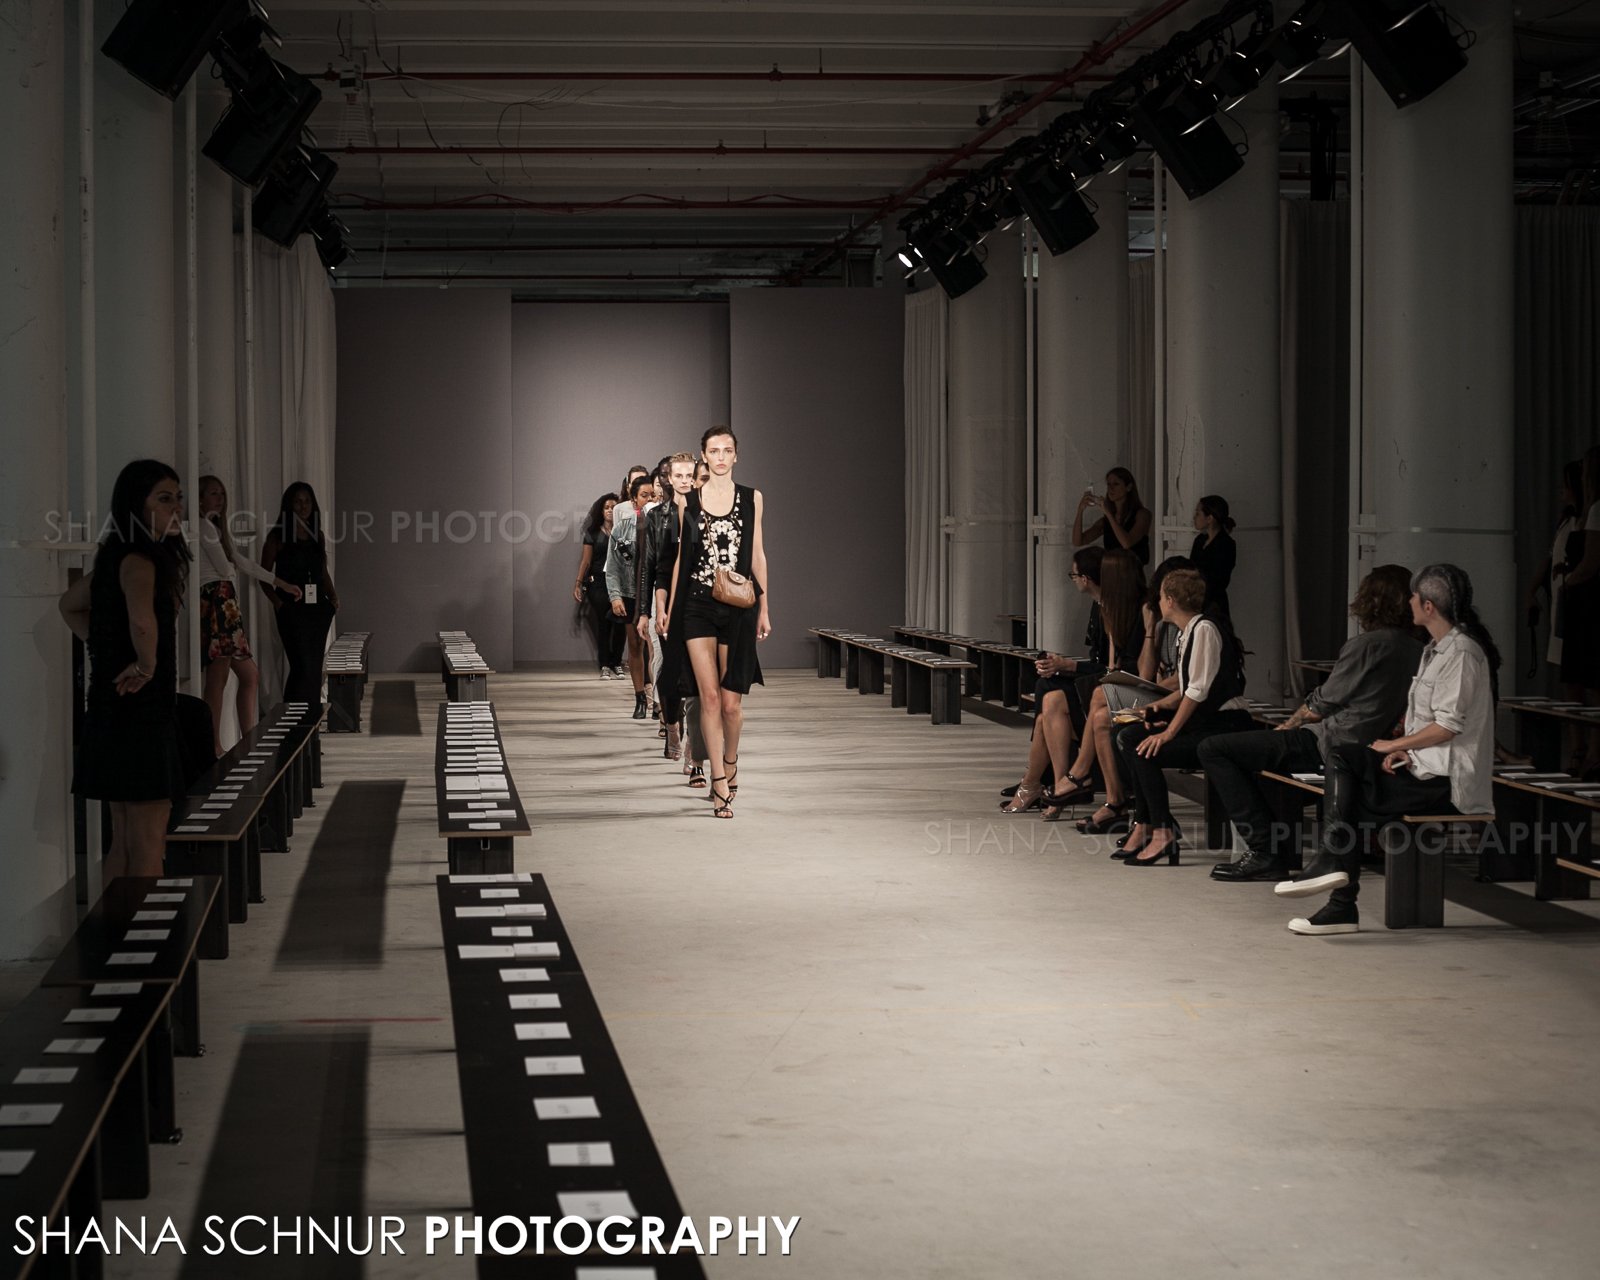 JMendel-Shana-Schnur-Photography--012.jpg